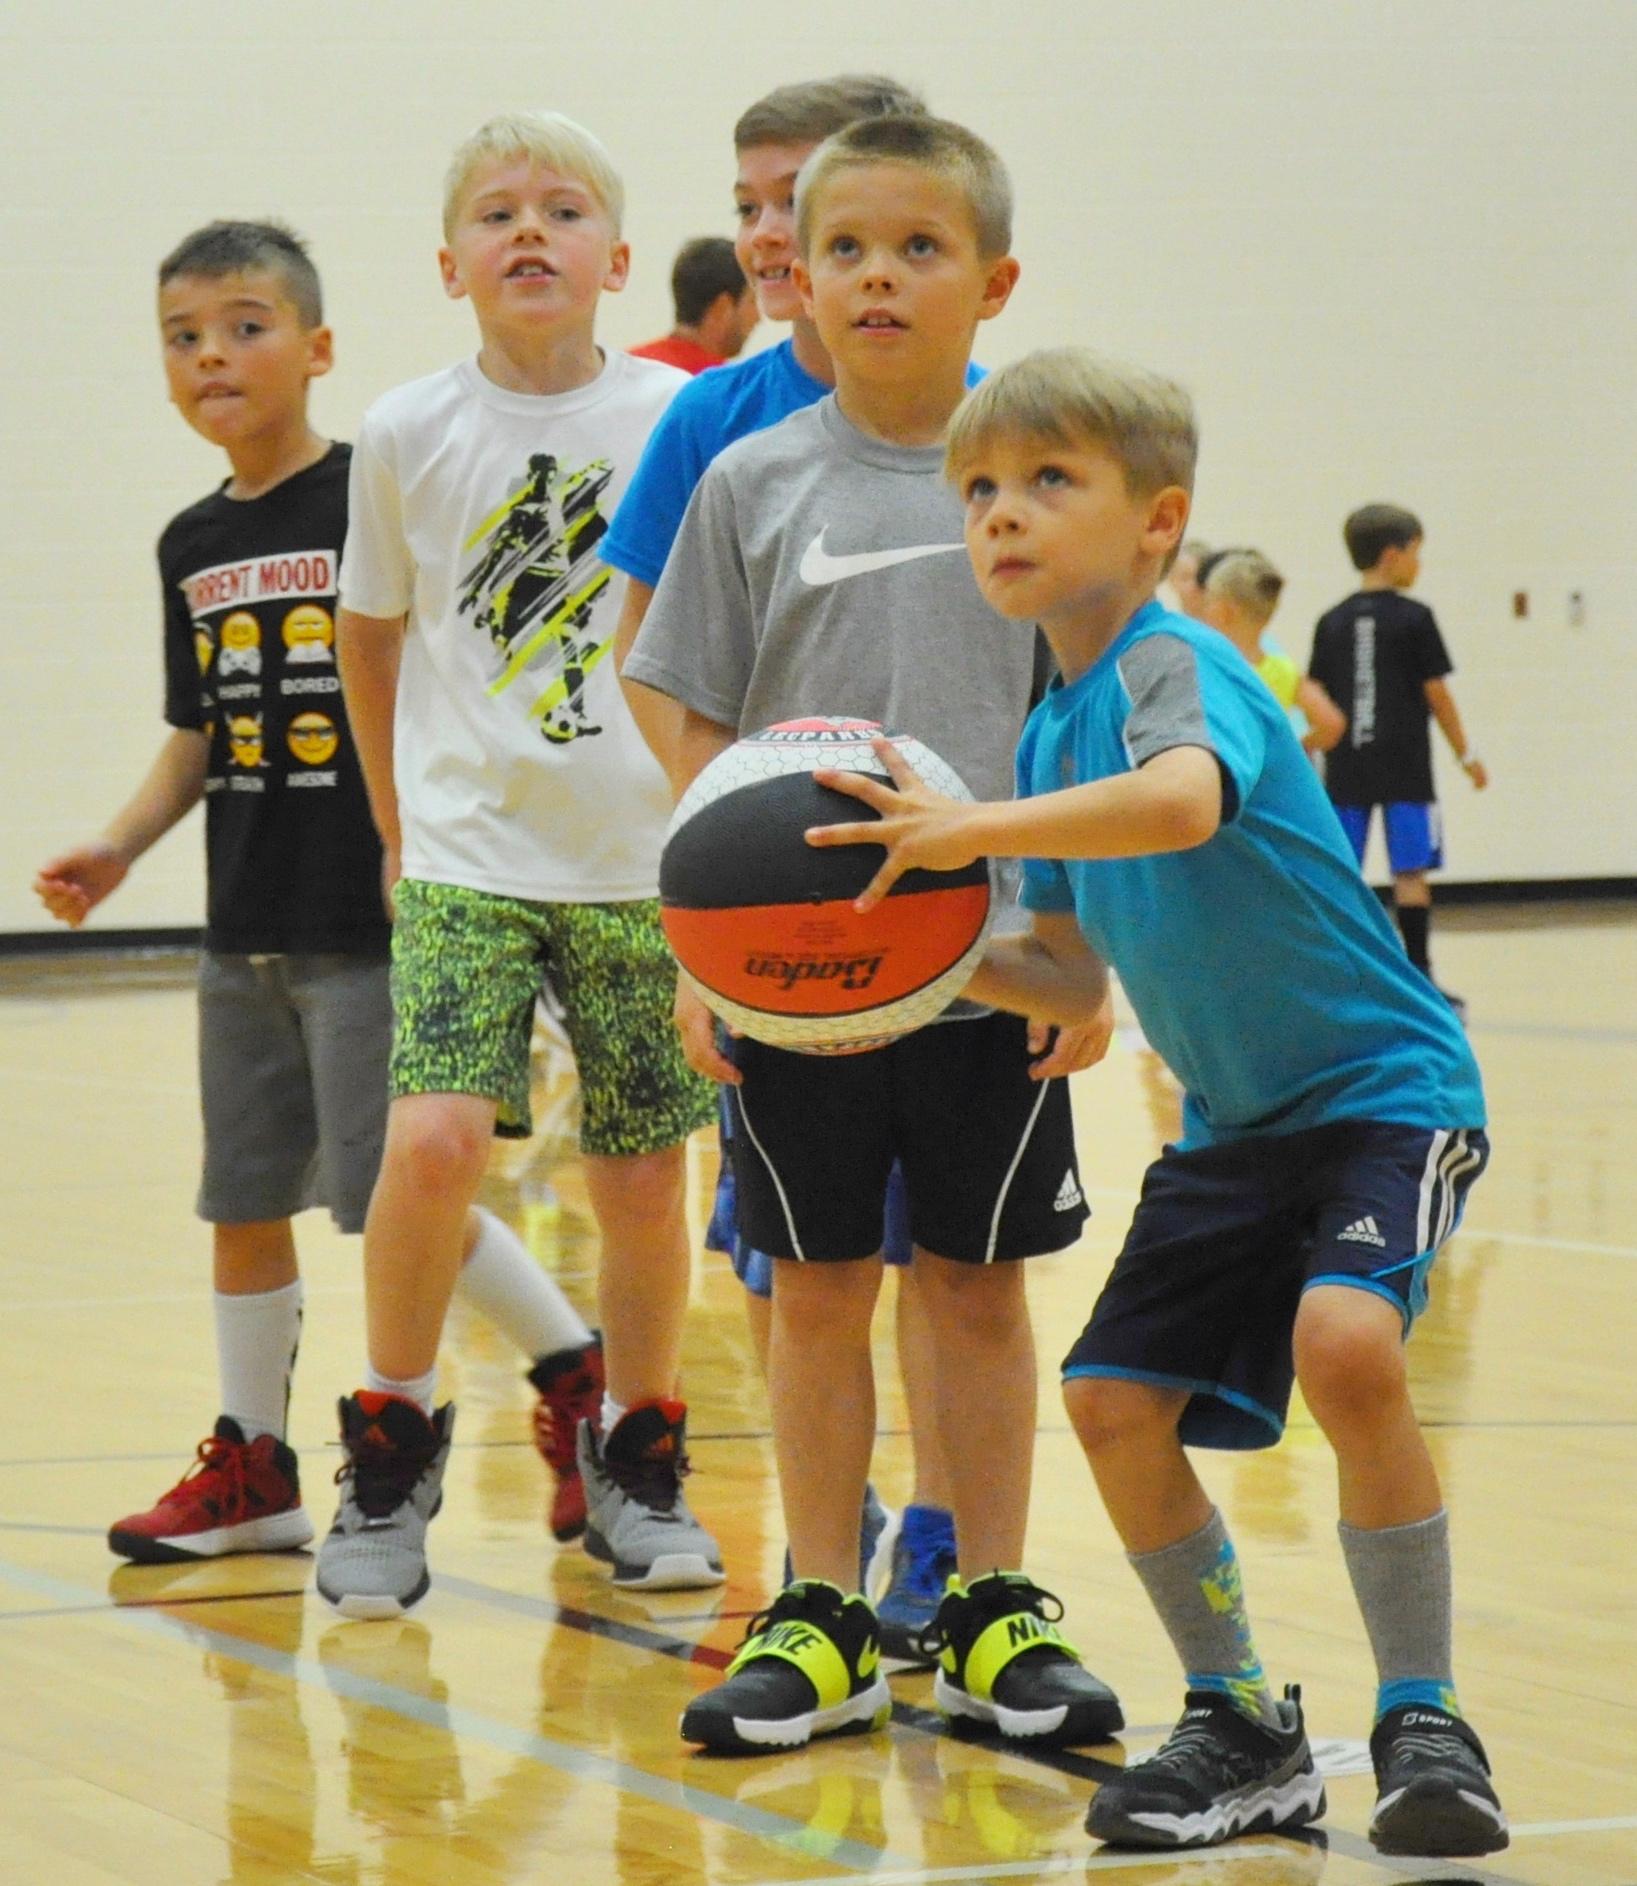 LJ Boys Basketball Caption 5.jpg